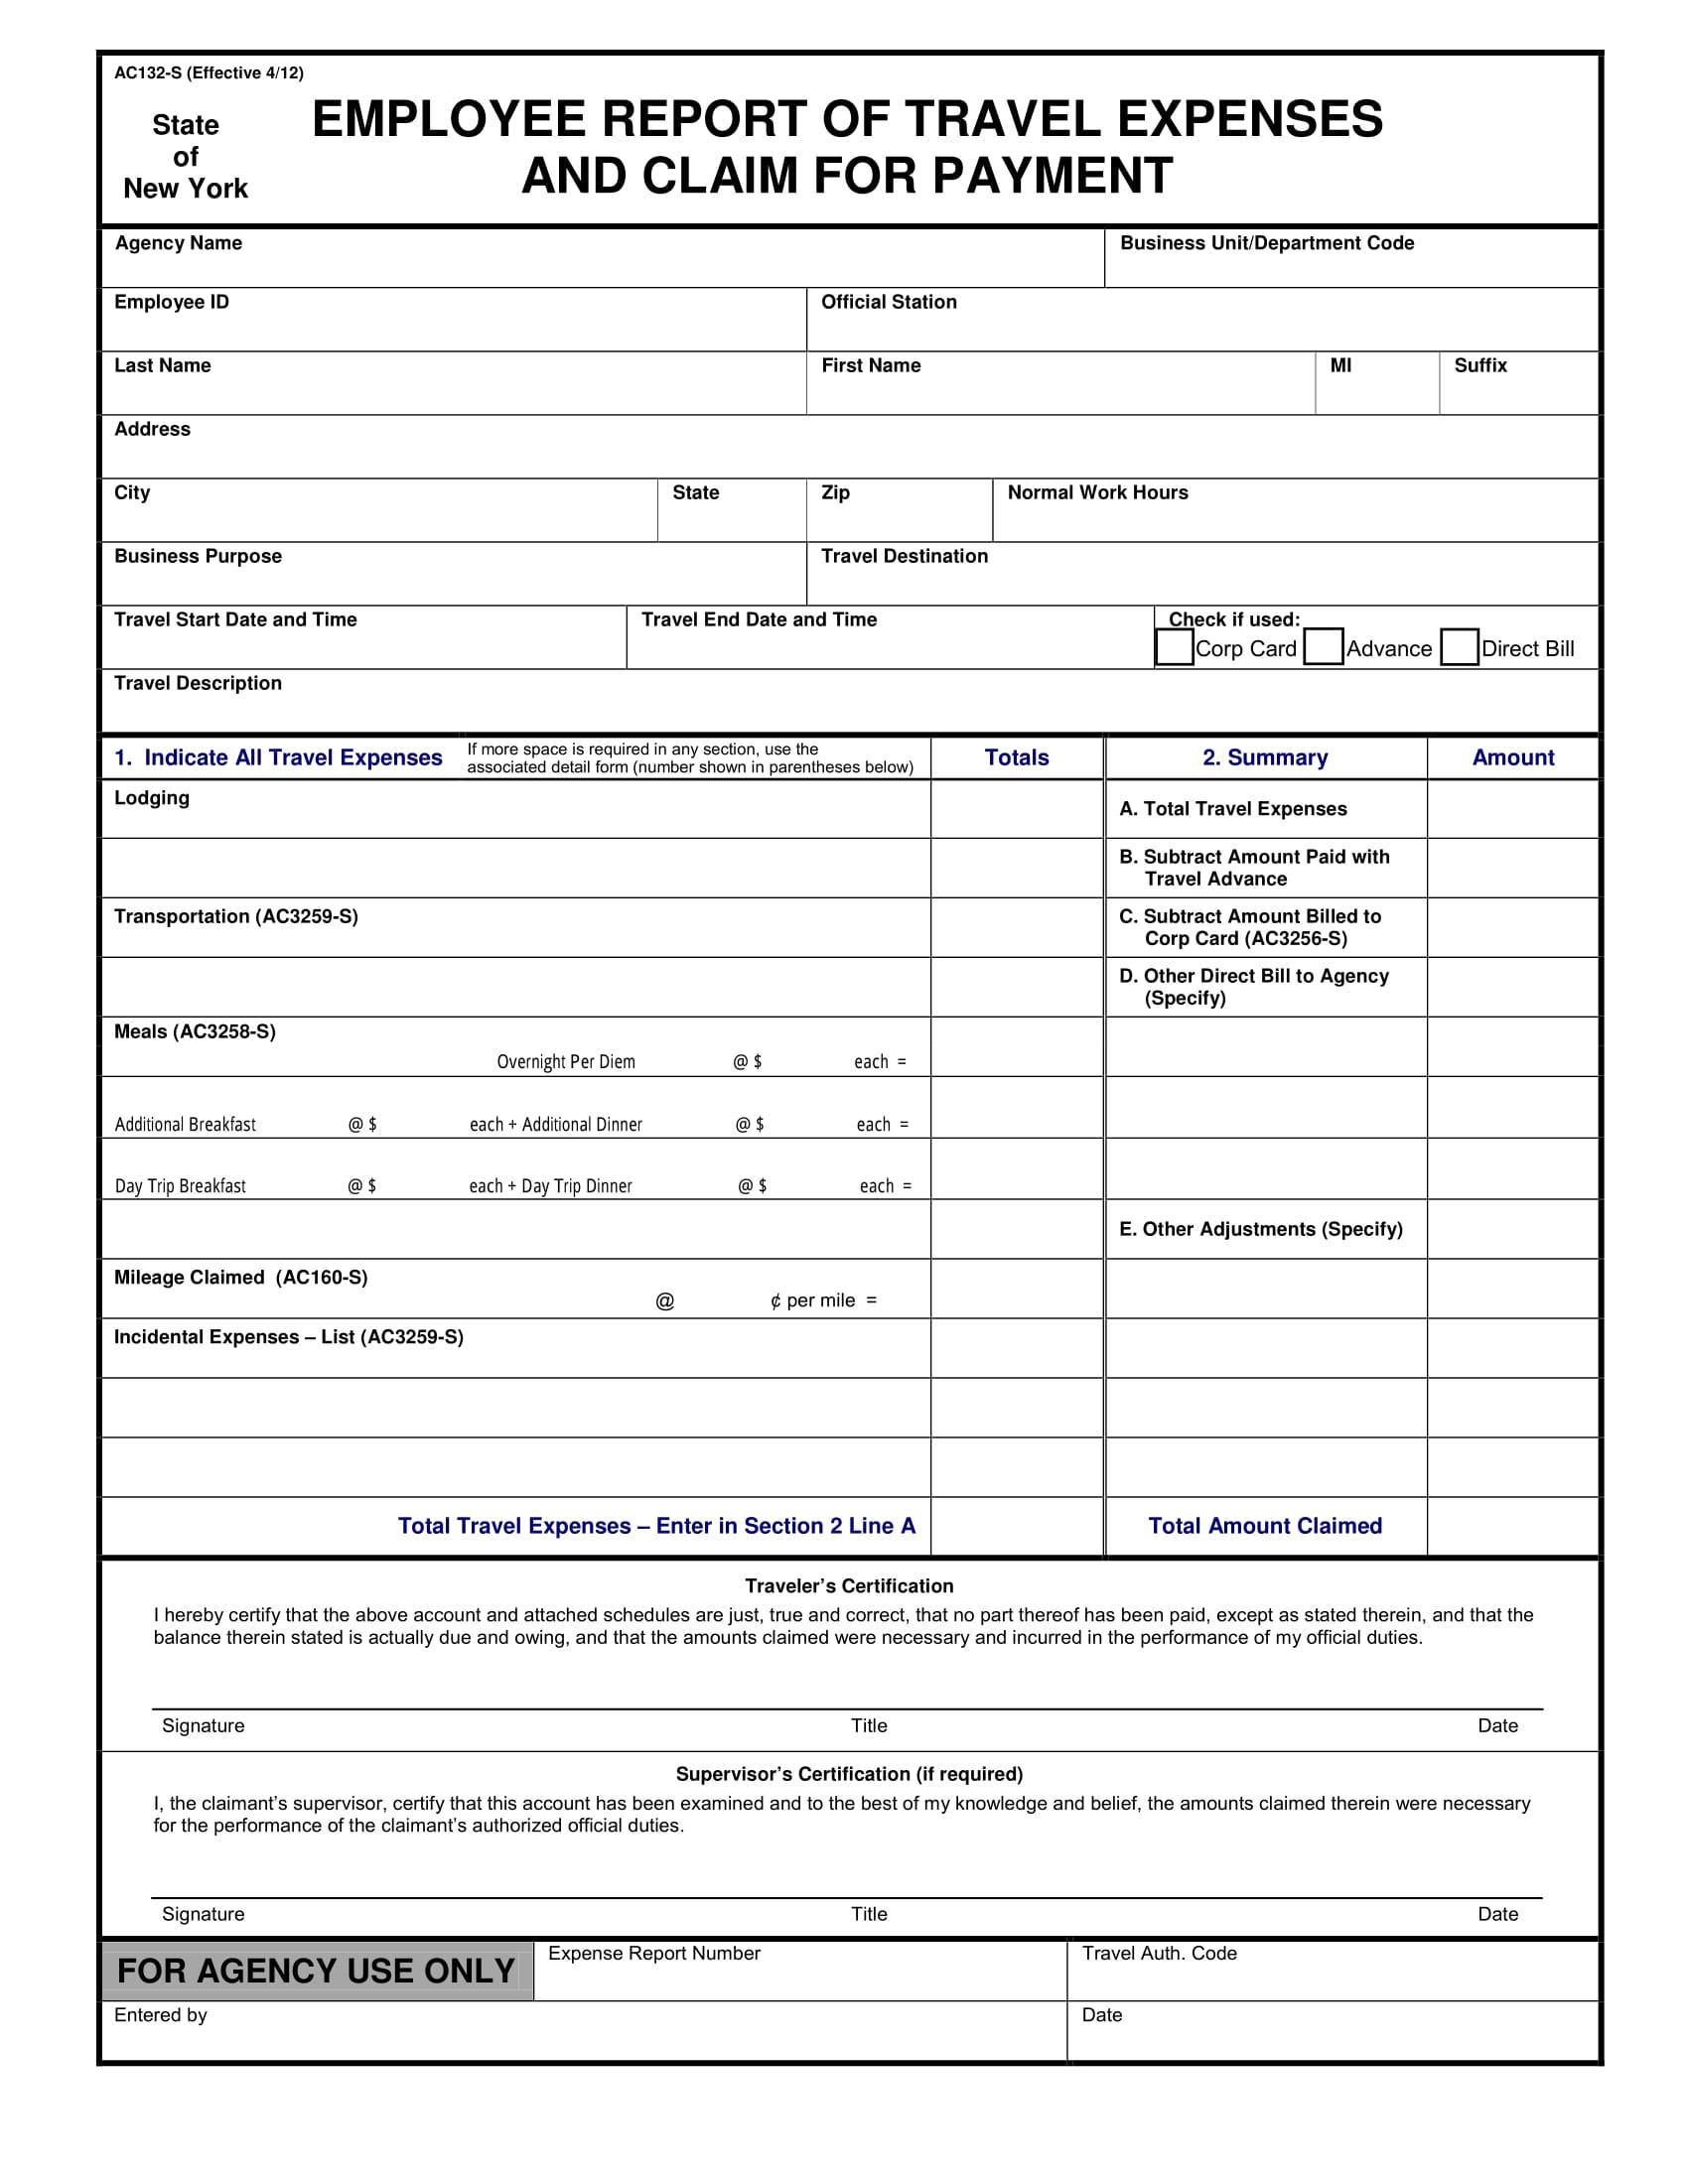 employee report of travel expenses 1